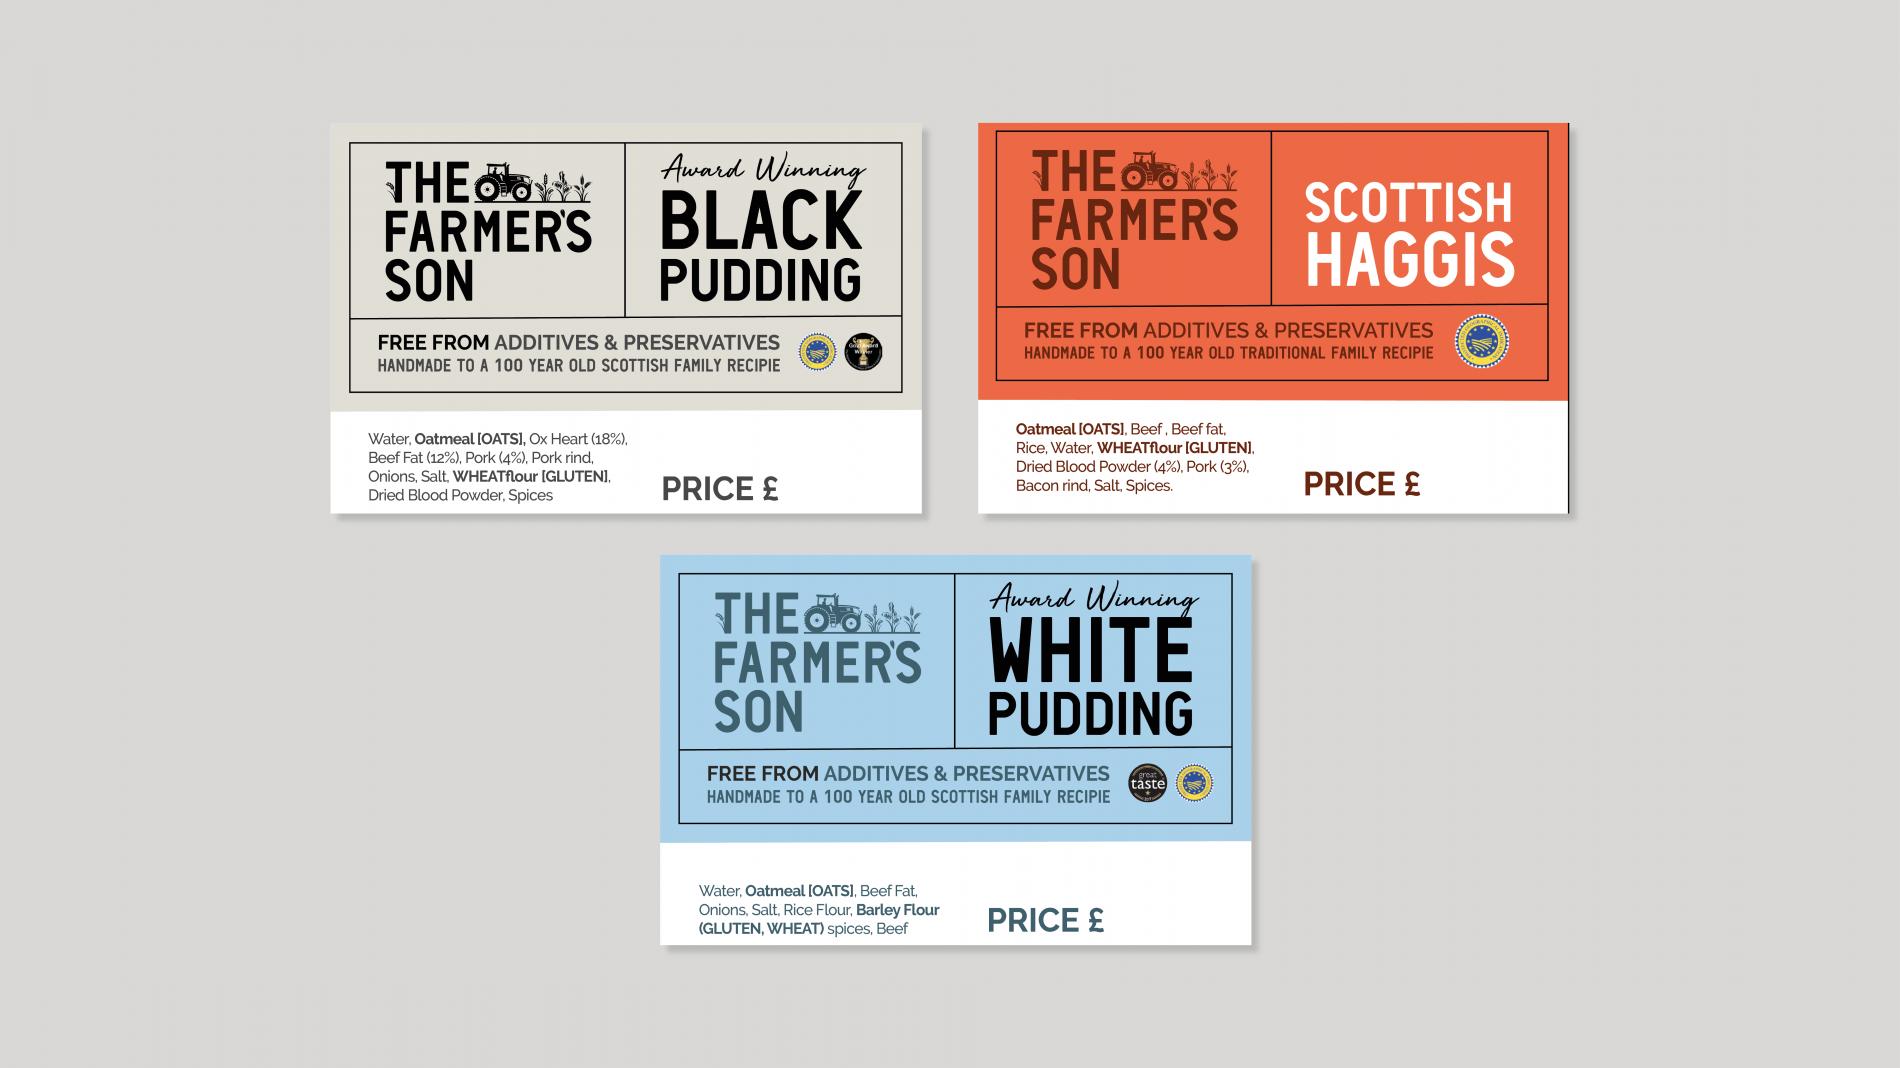 The Farmer's Son price tickets